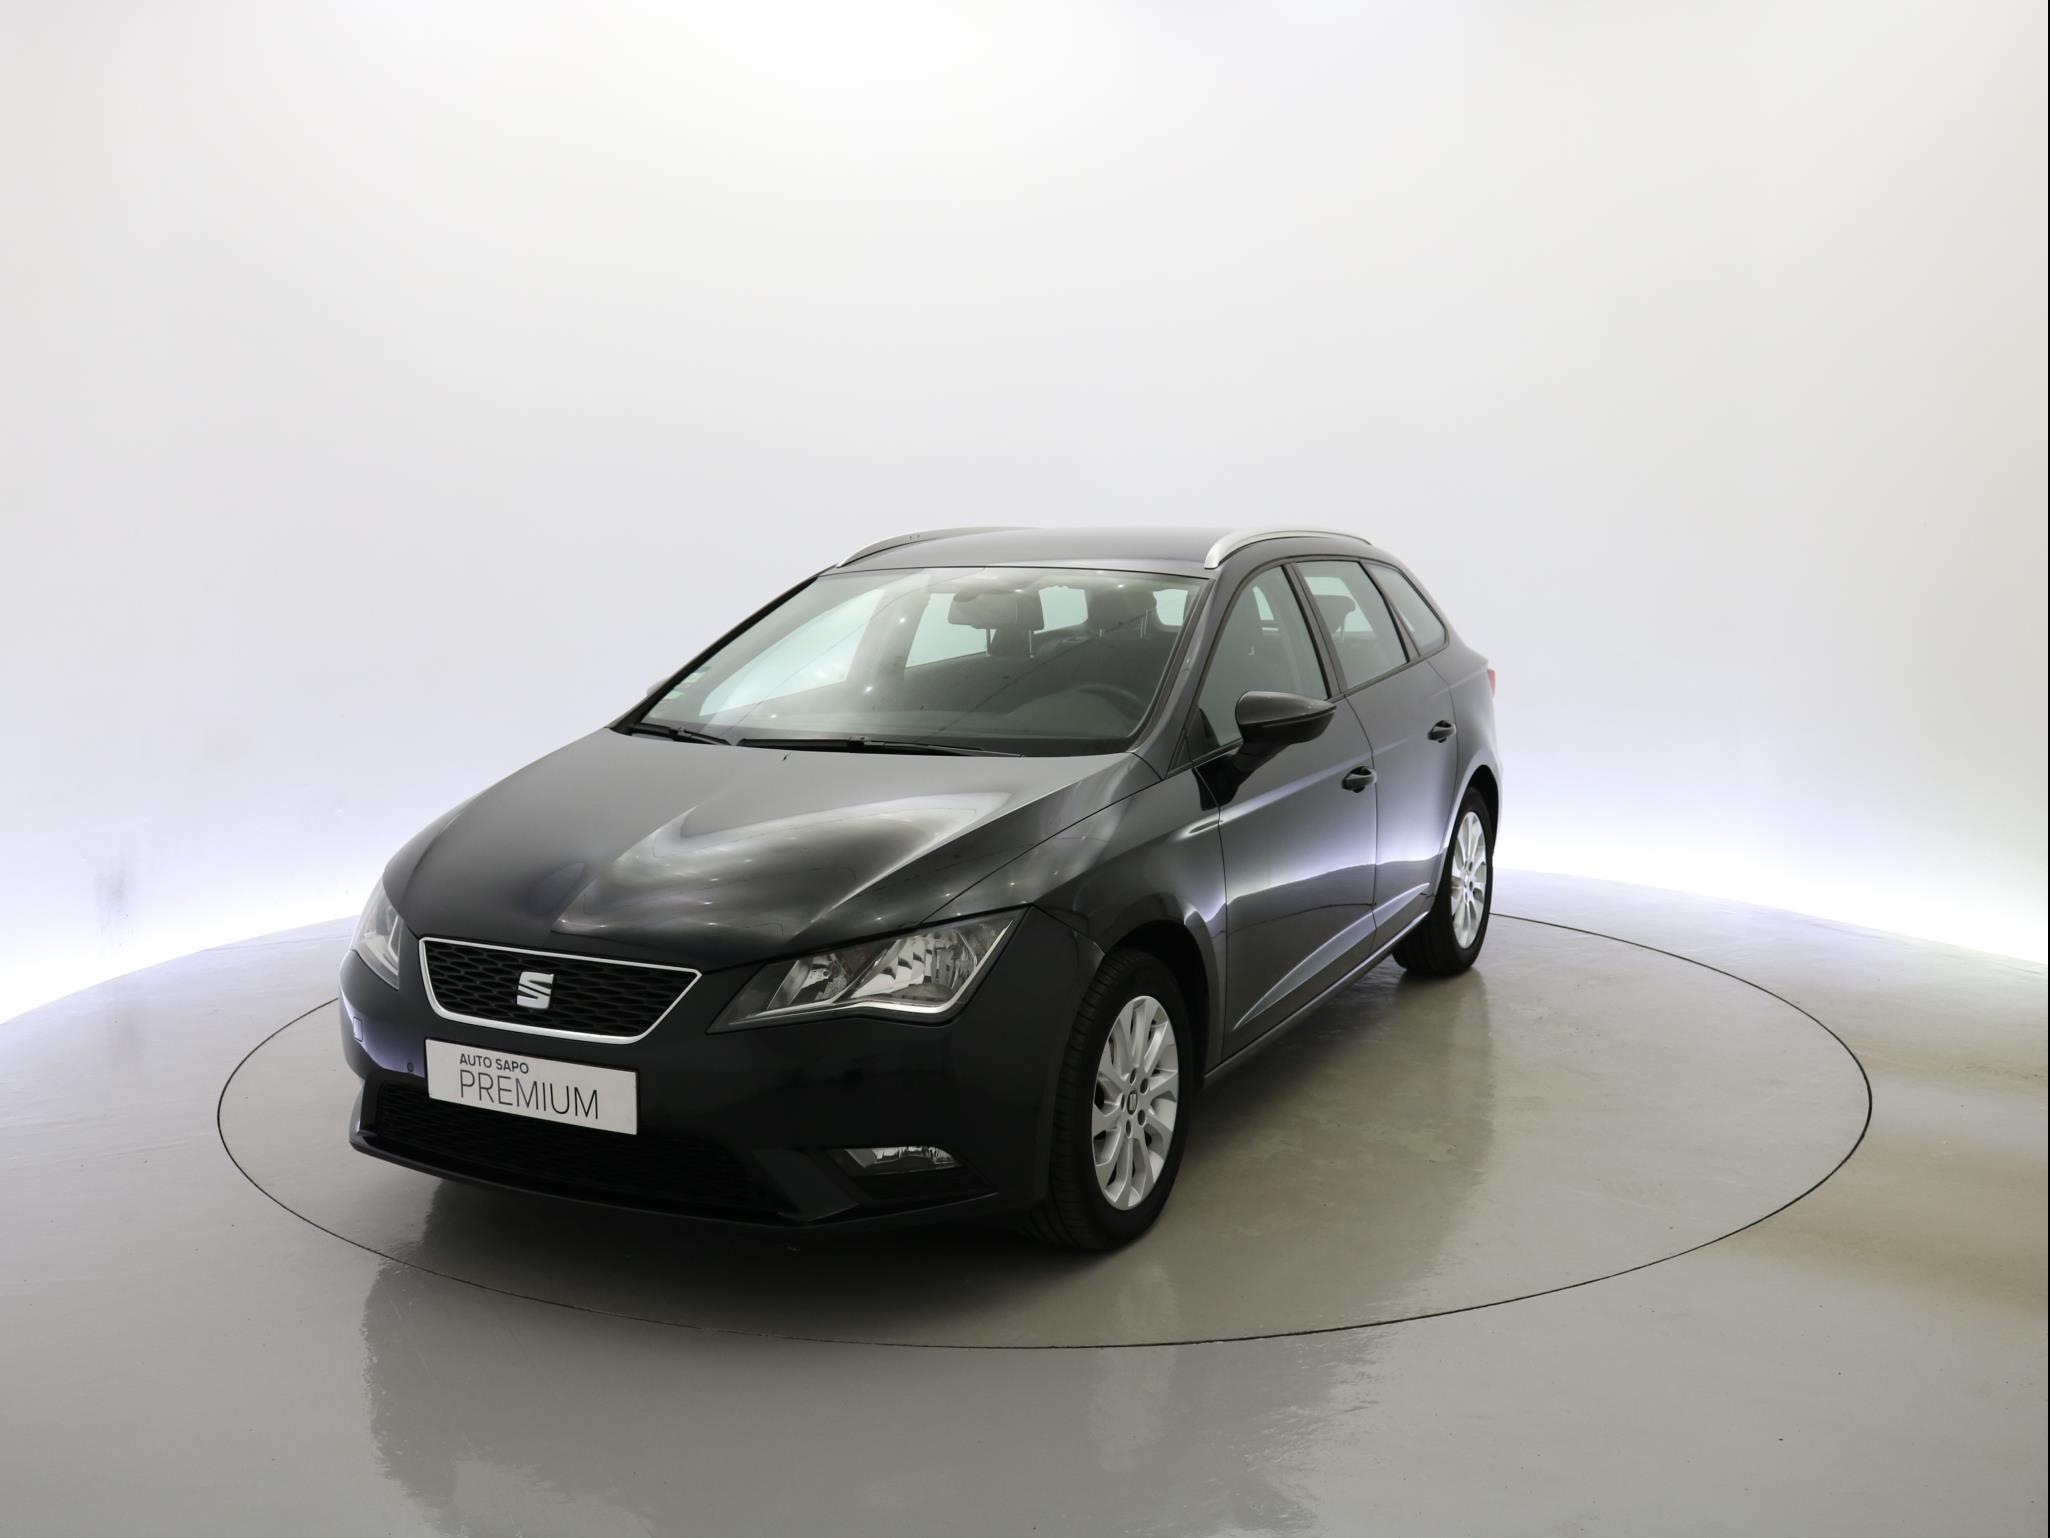 Seat Leon ST 1.6 TDi Reference Ecomotive